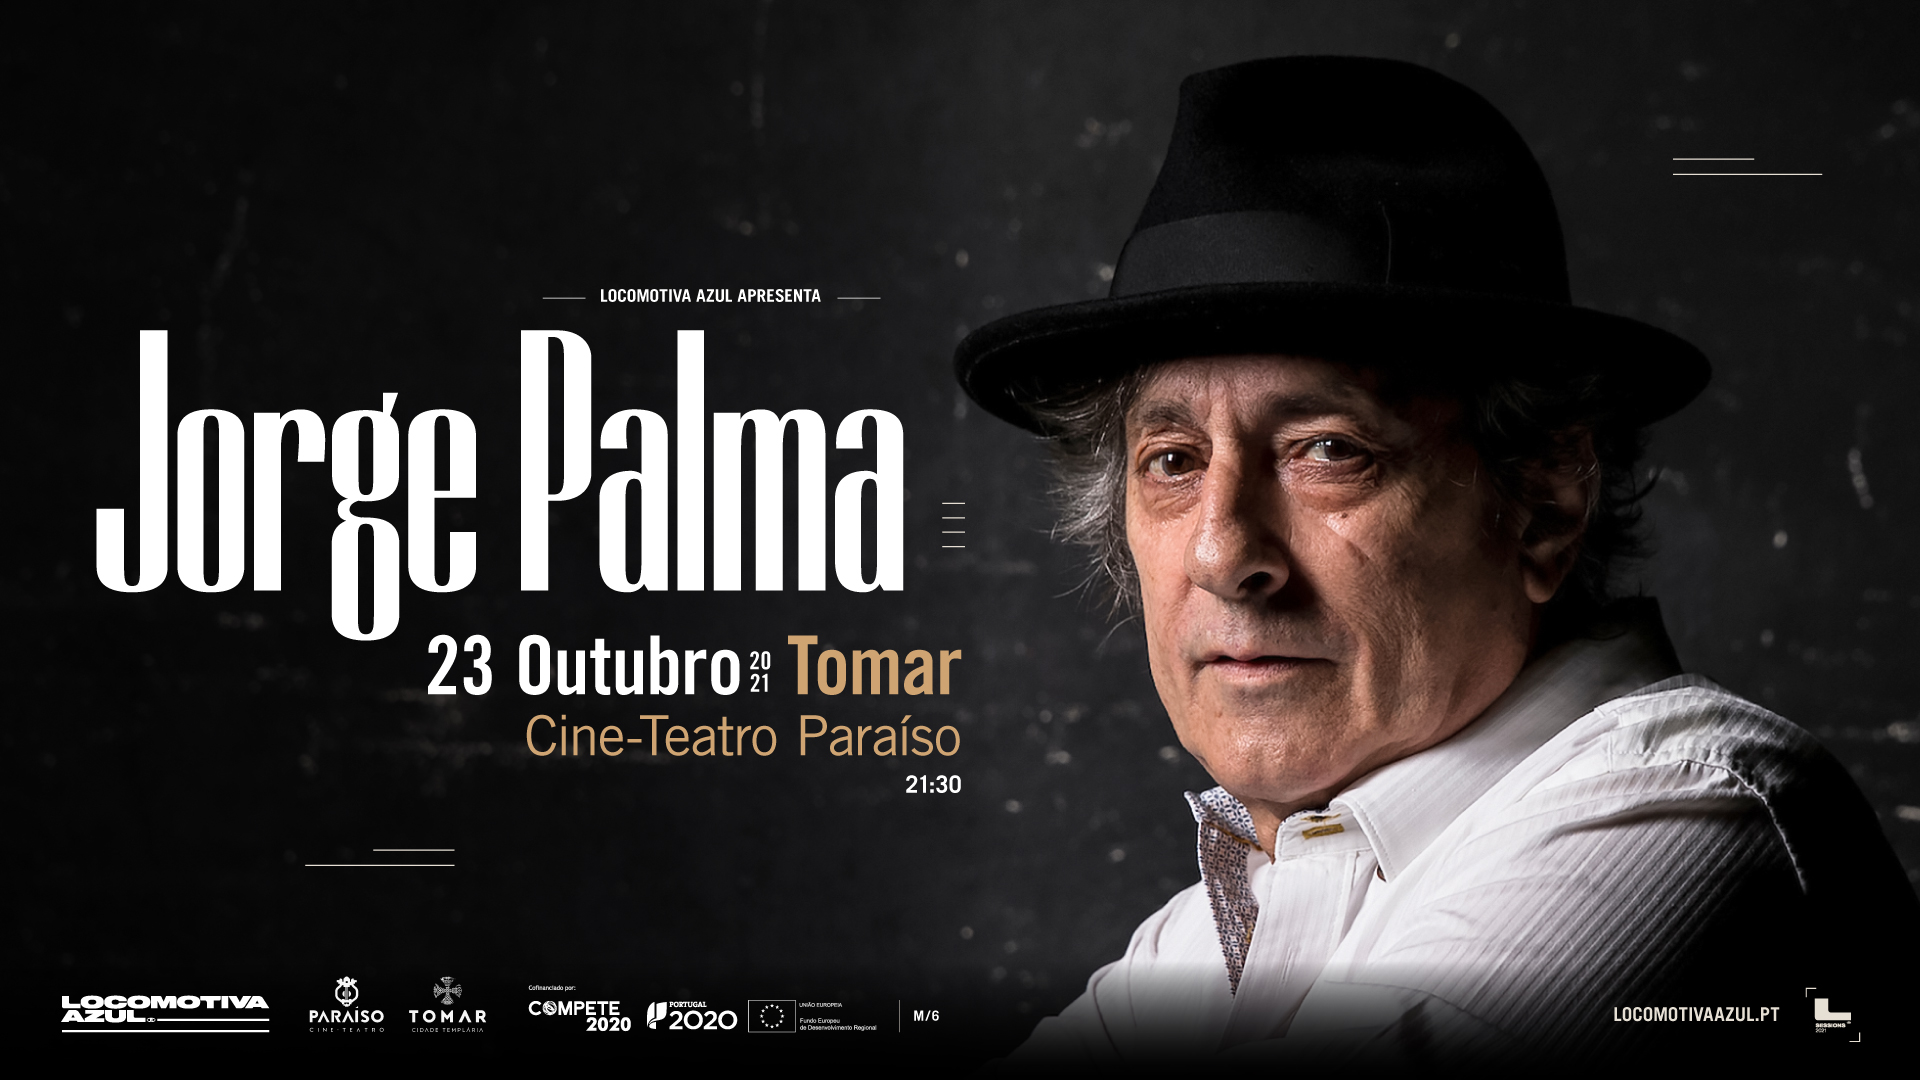 Jorge Palma - Tomar: ESGOTADO